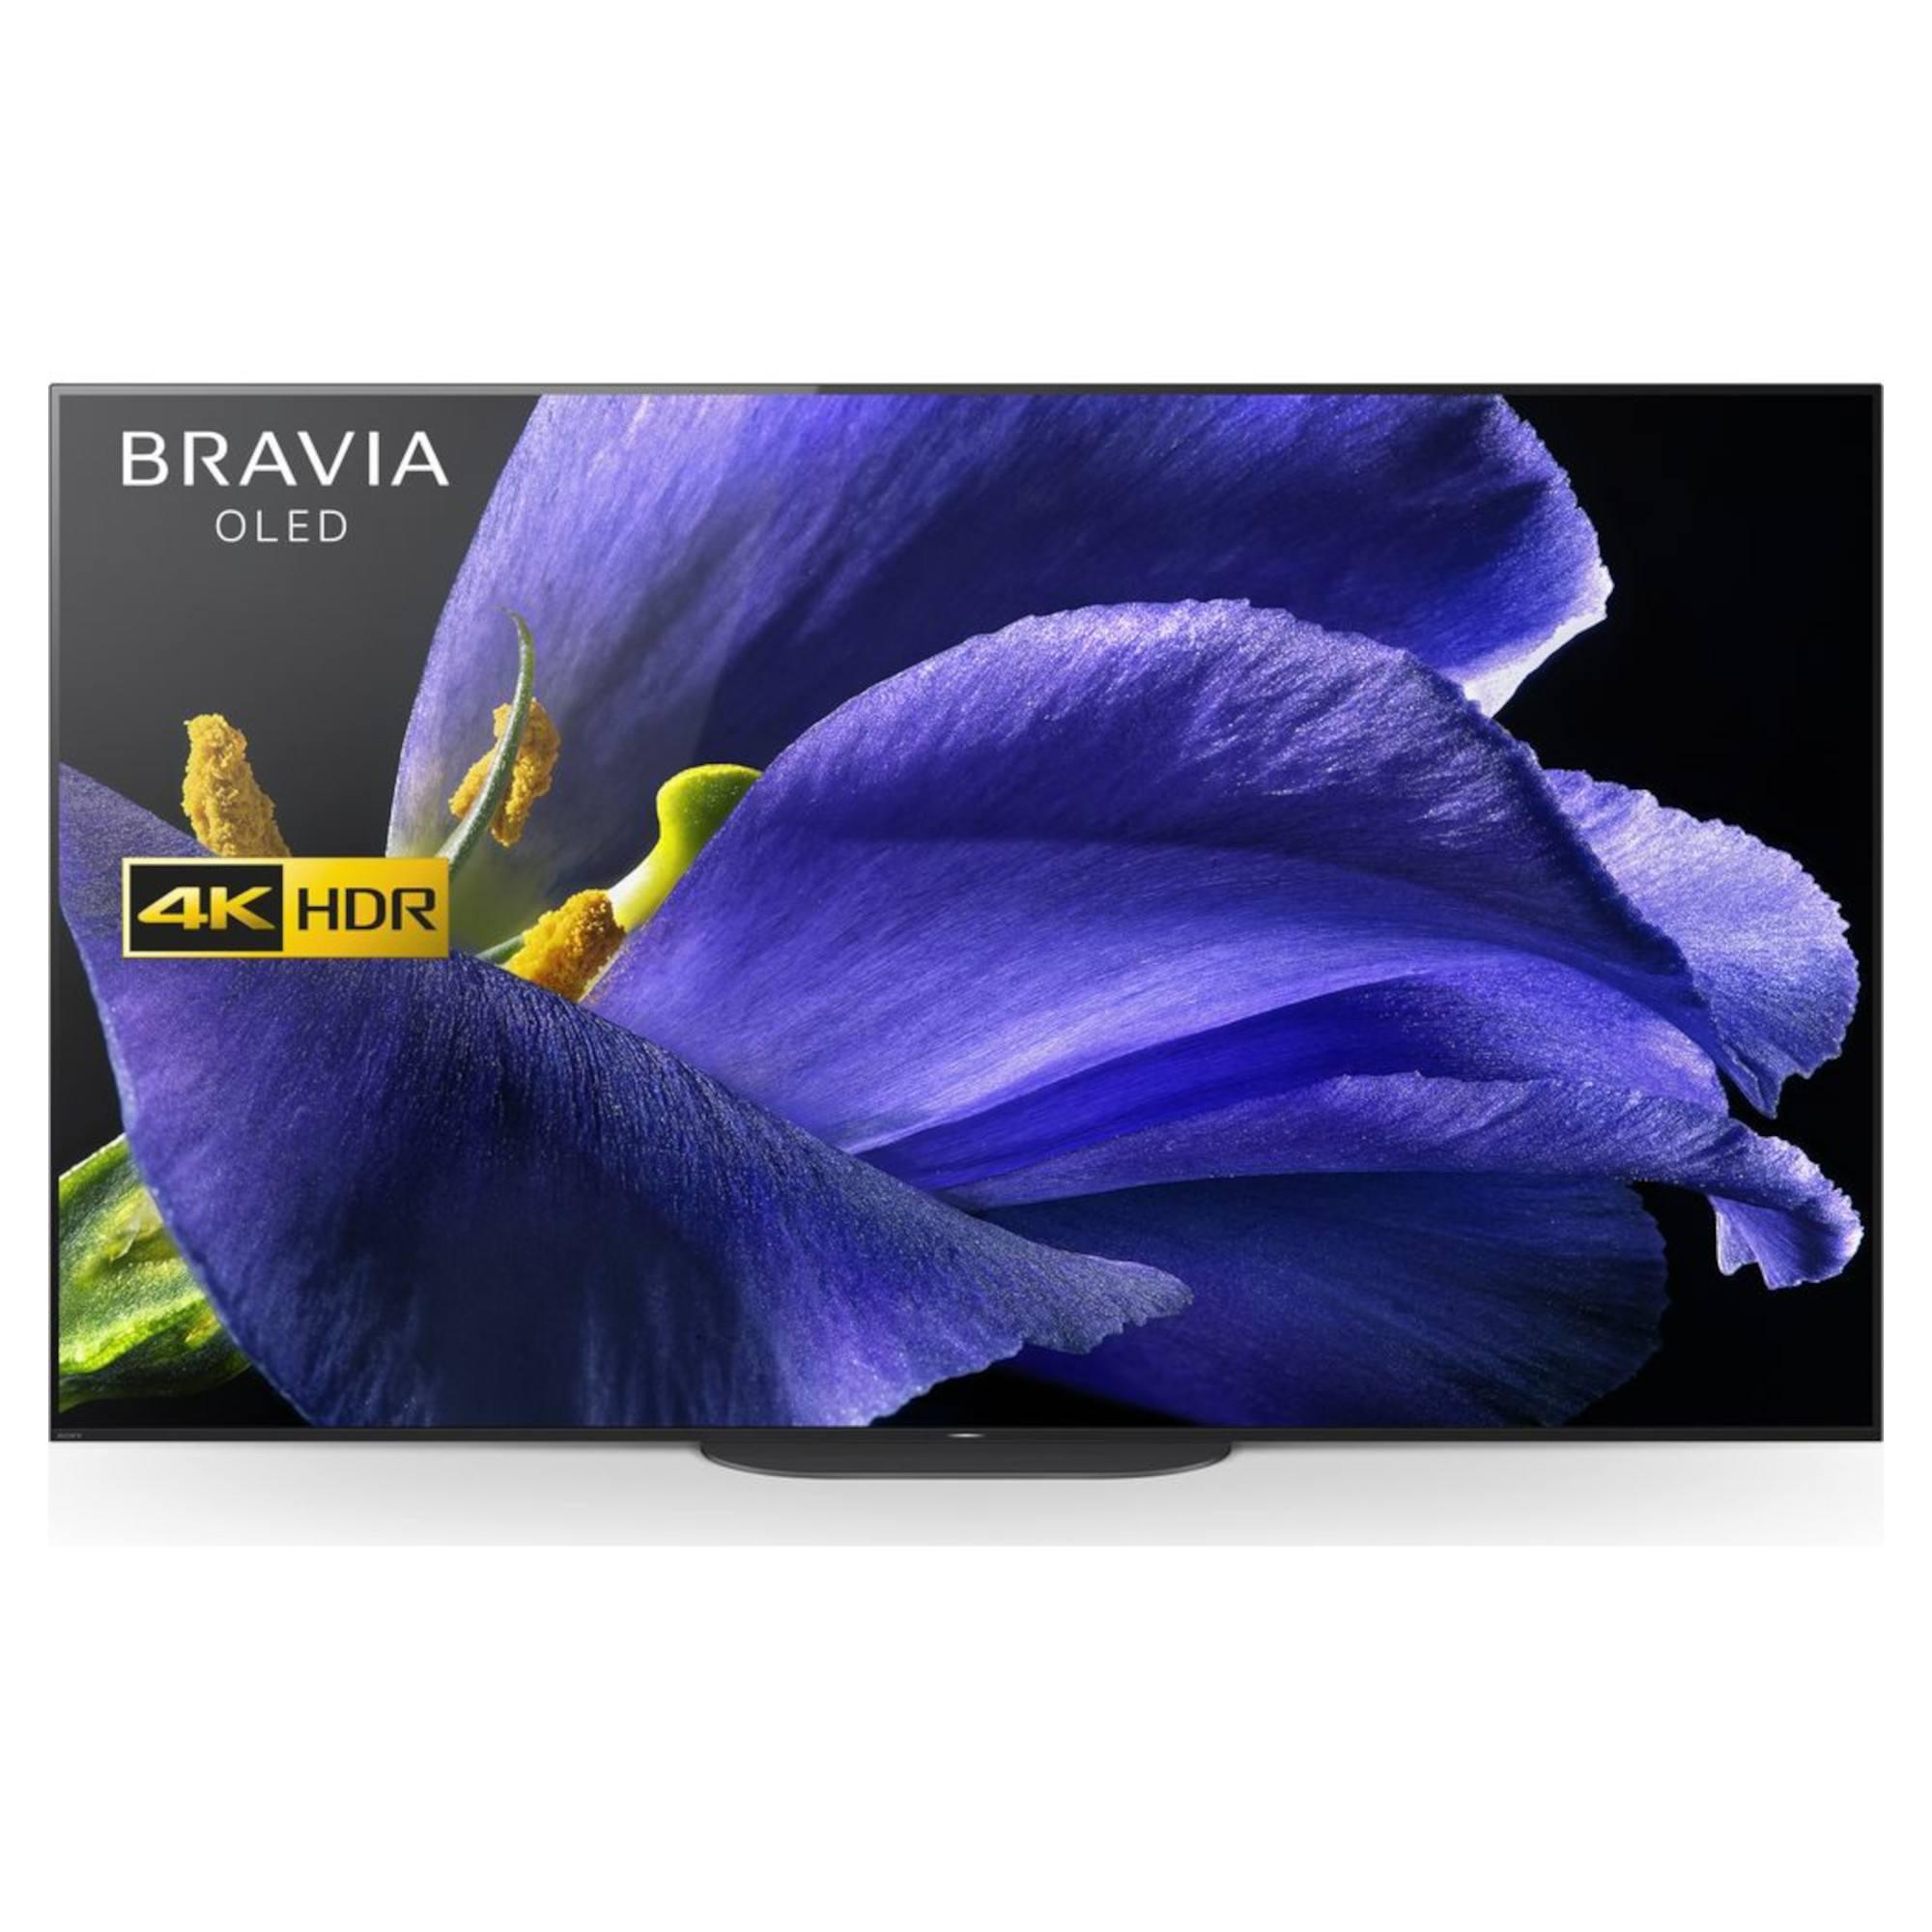 "Sony KD-77AG9BU Bravia KD77AG9BU 77"" 4K Ultra HD OLED TV - £2,969.10 With Code @ Hughes -saving £329.10 And Claim a free £50.00 Gift card"